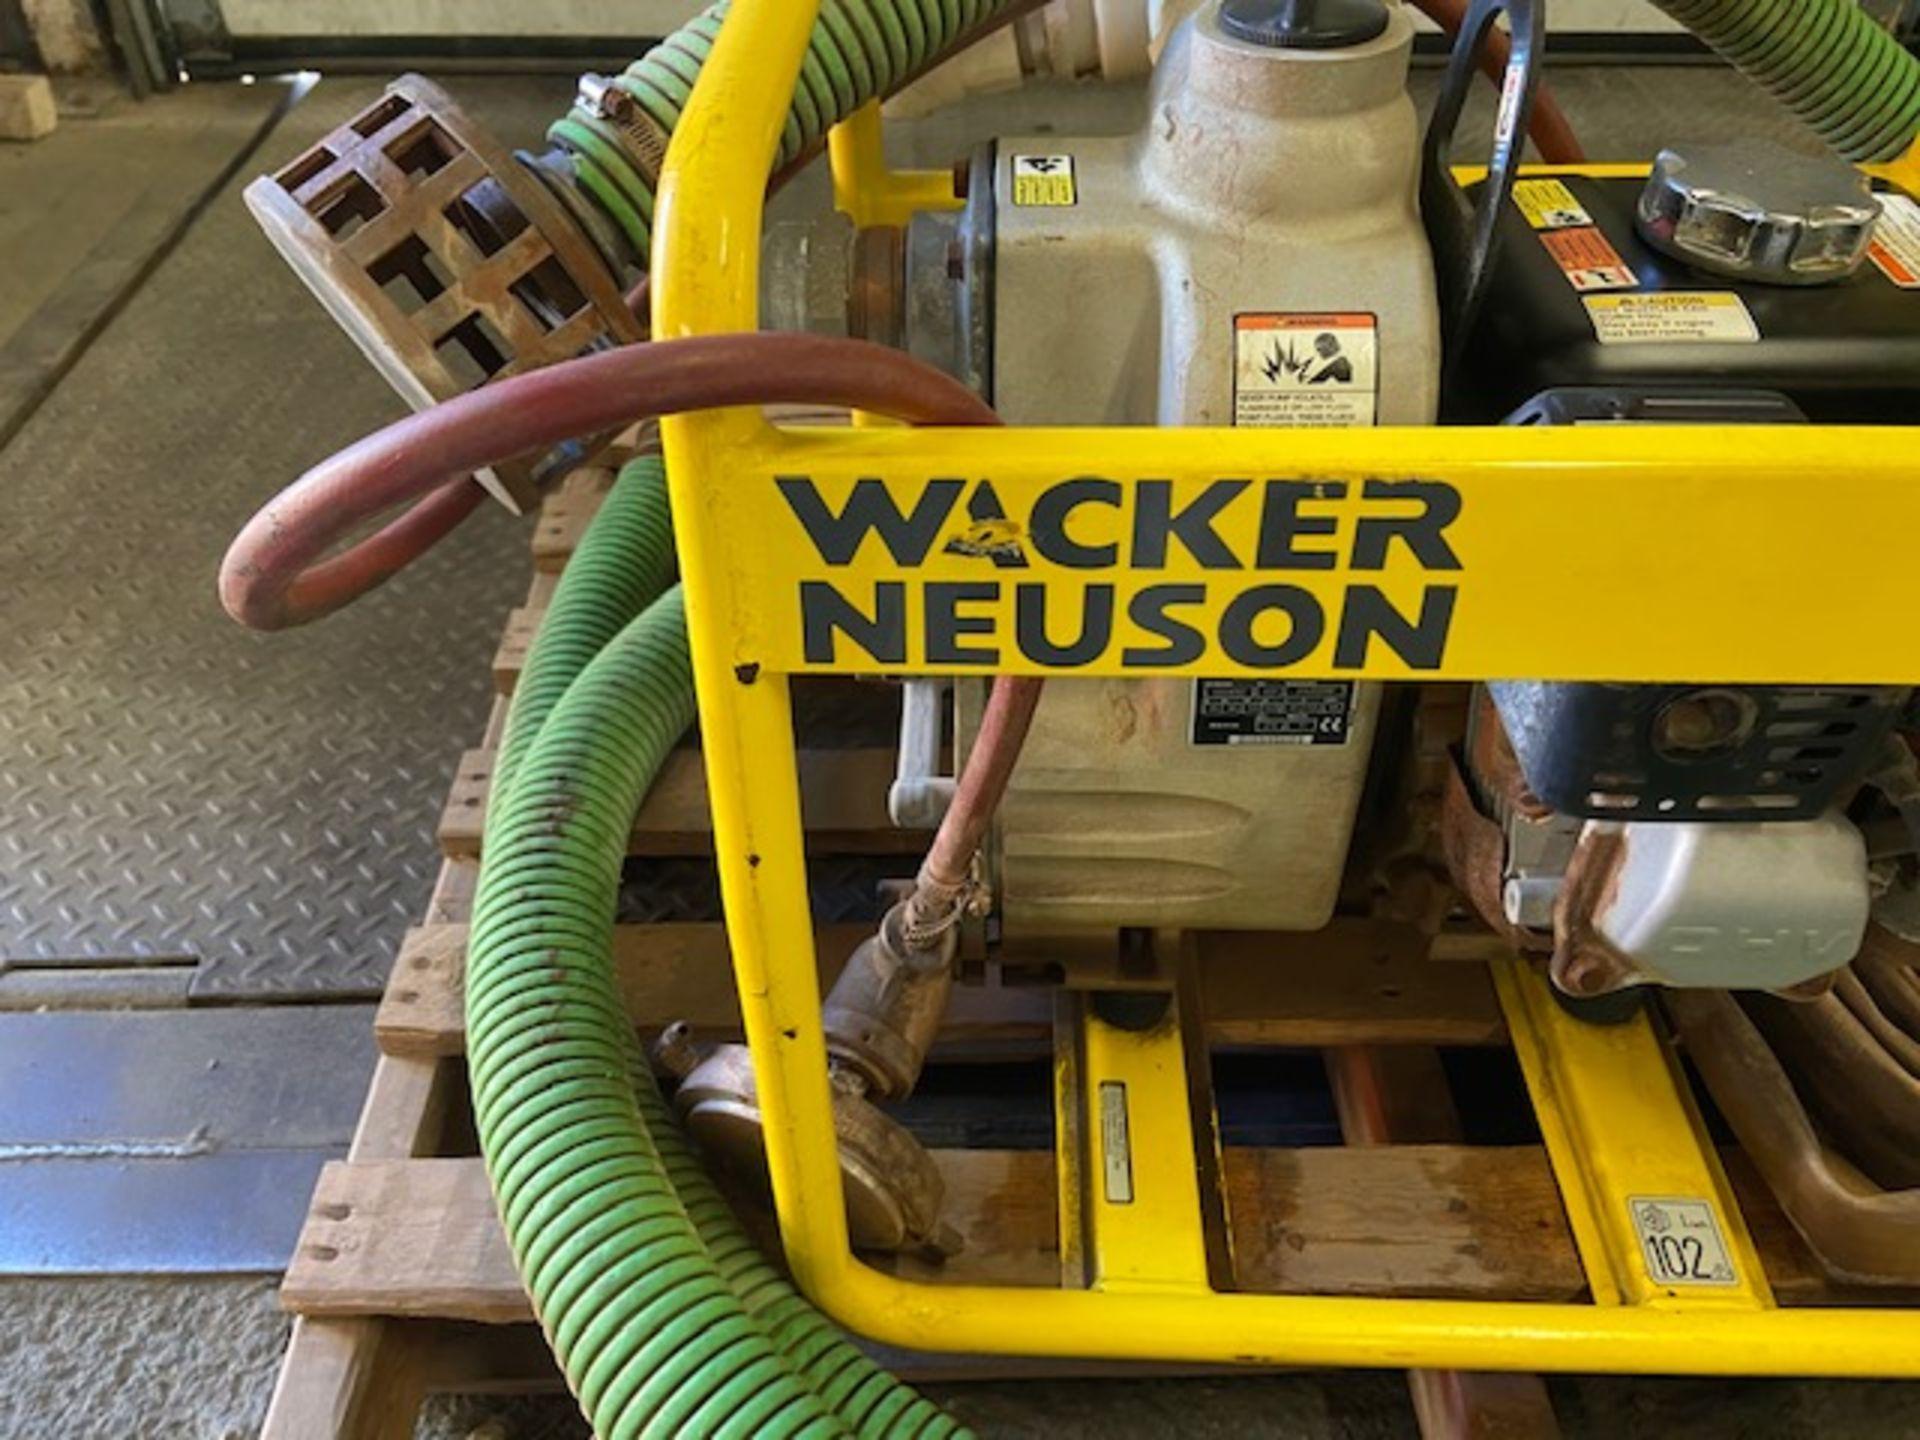 Wacker Neuson PT2 Water Pump Unit with Honda GX160 Motor - Image 2 of 3